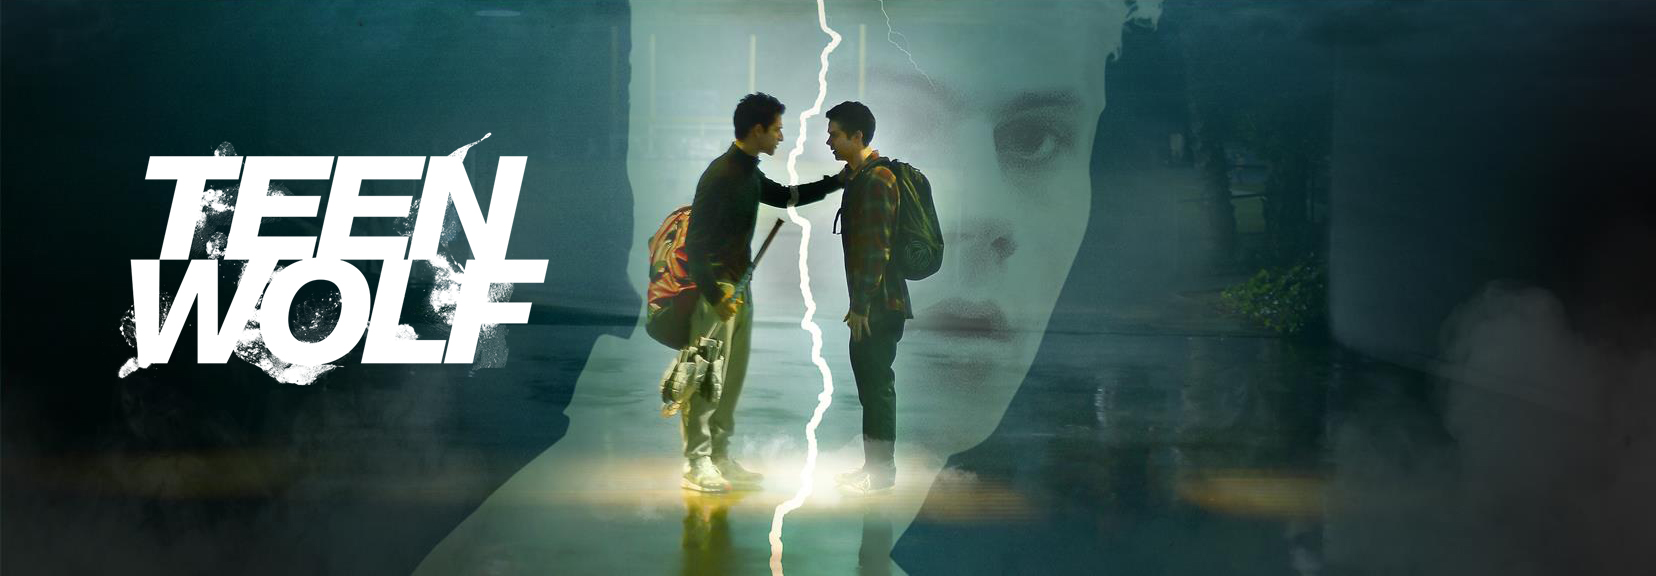 Teen wolf season 6 clip free stock Watch Teen Wolf - Season 6 For Free On yesmovies.to clip free stock